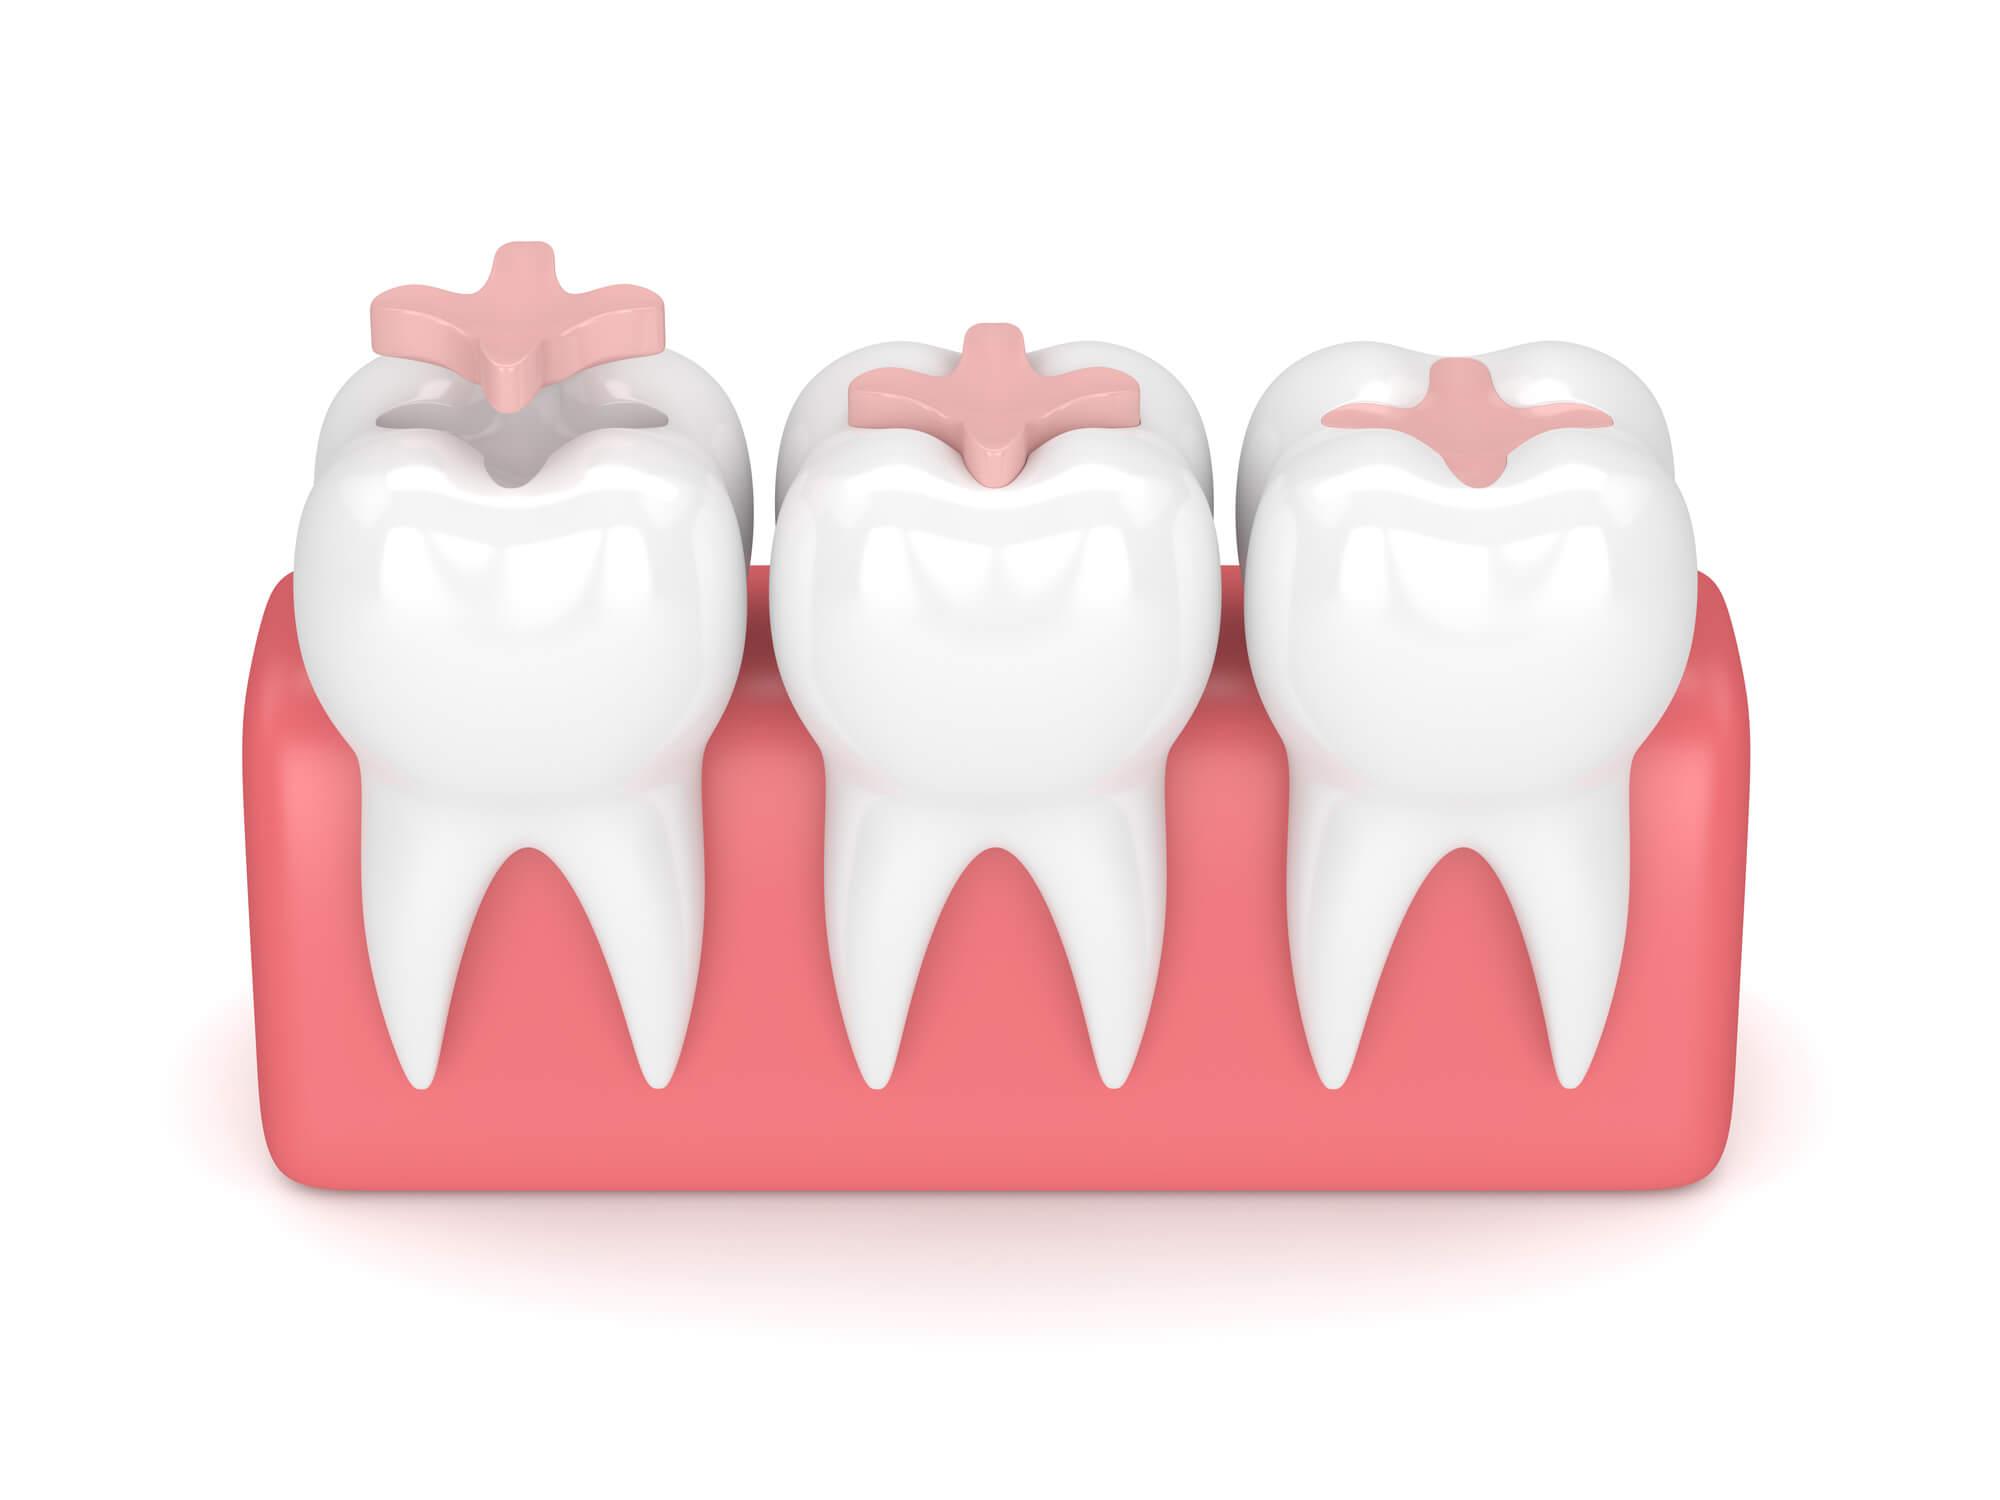 3D model of teeth with dental sealants in Seneca